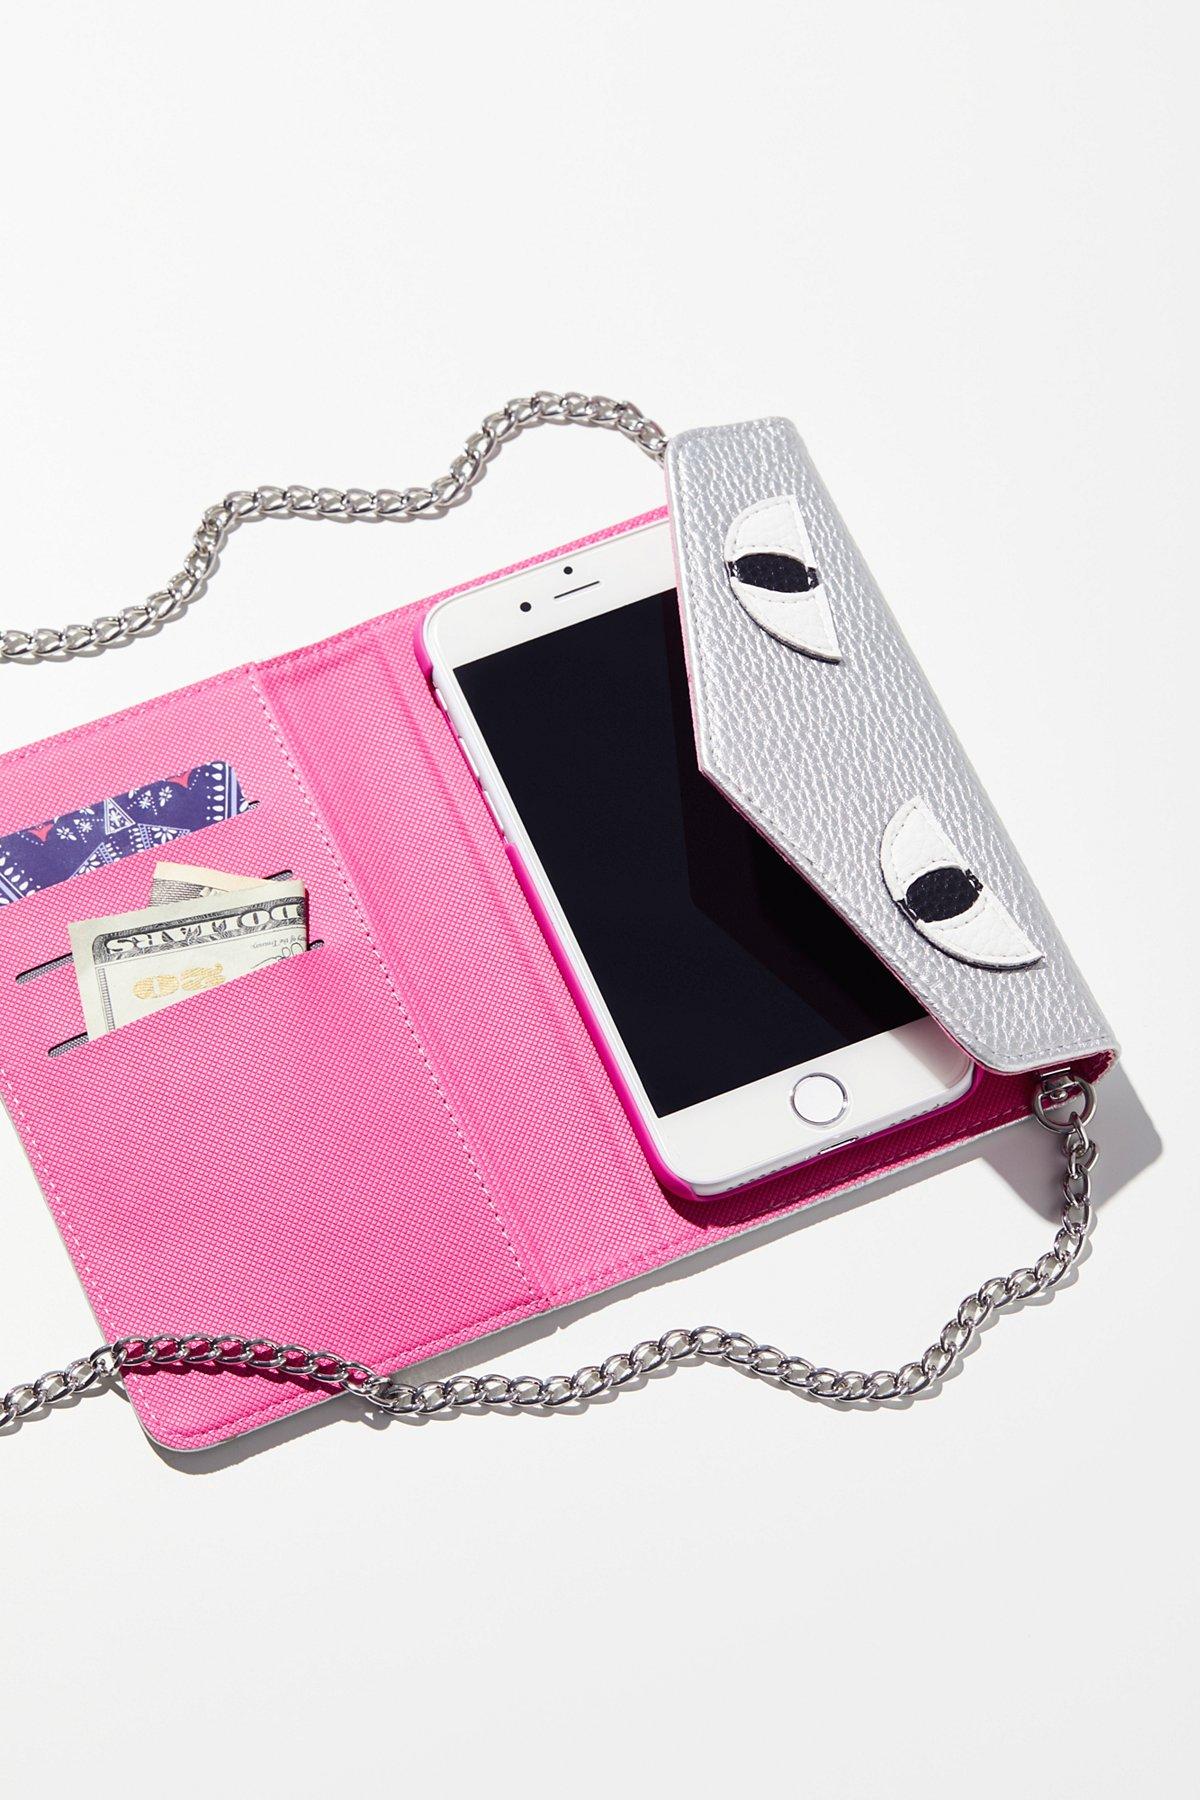 Monster Crossbody iPhone Case